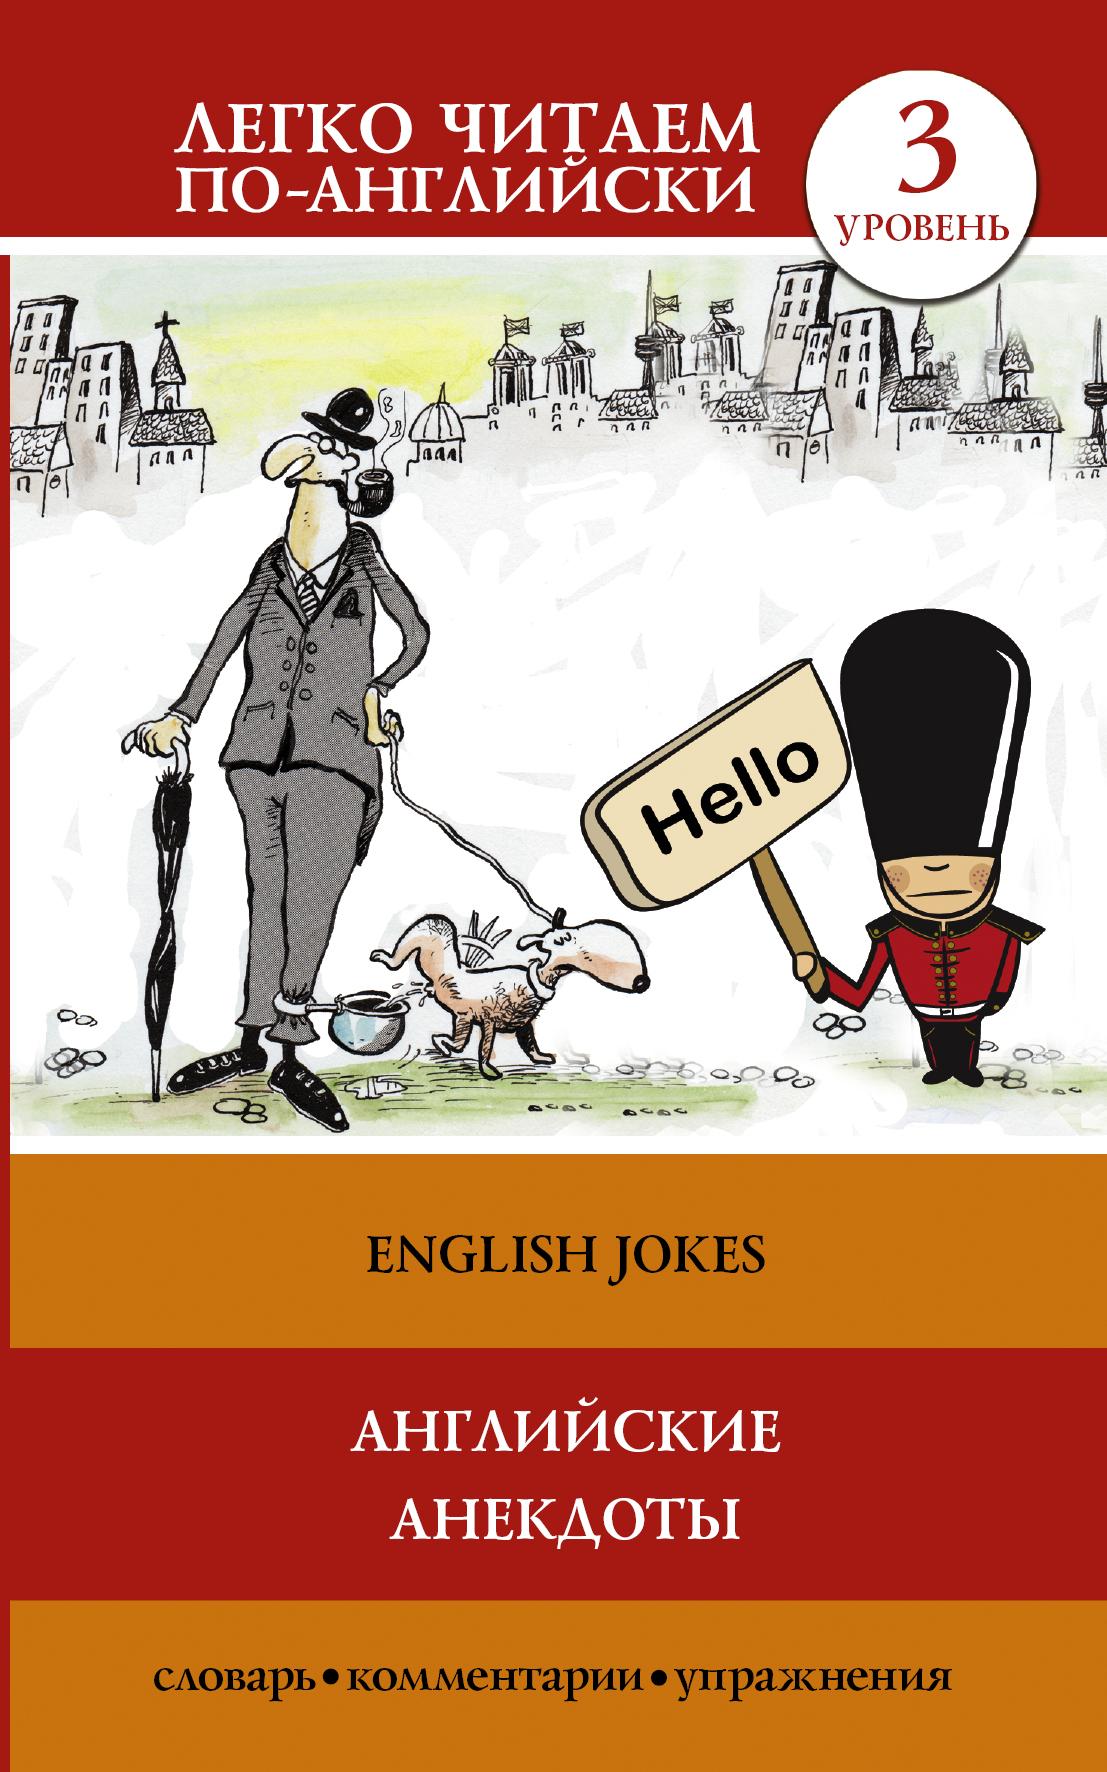 Английские анекдоты ( Матвеев С.А.  )